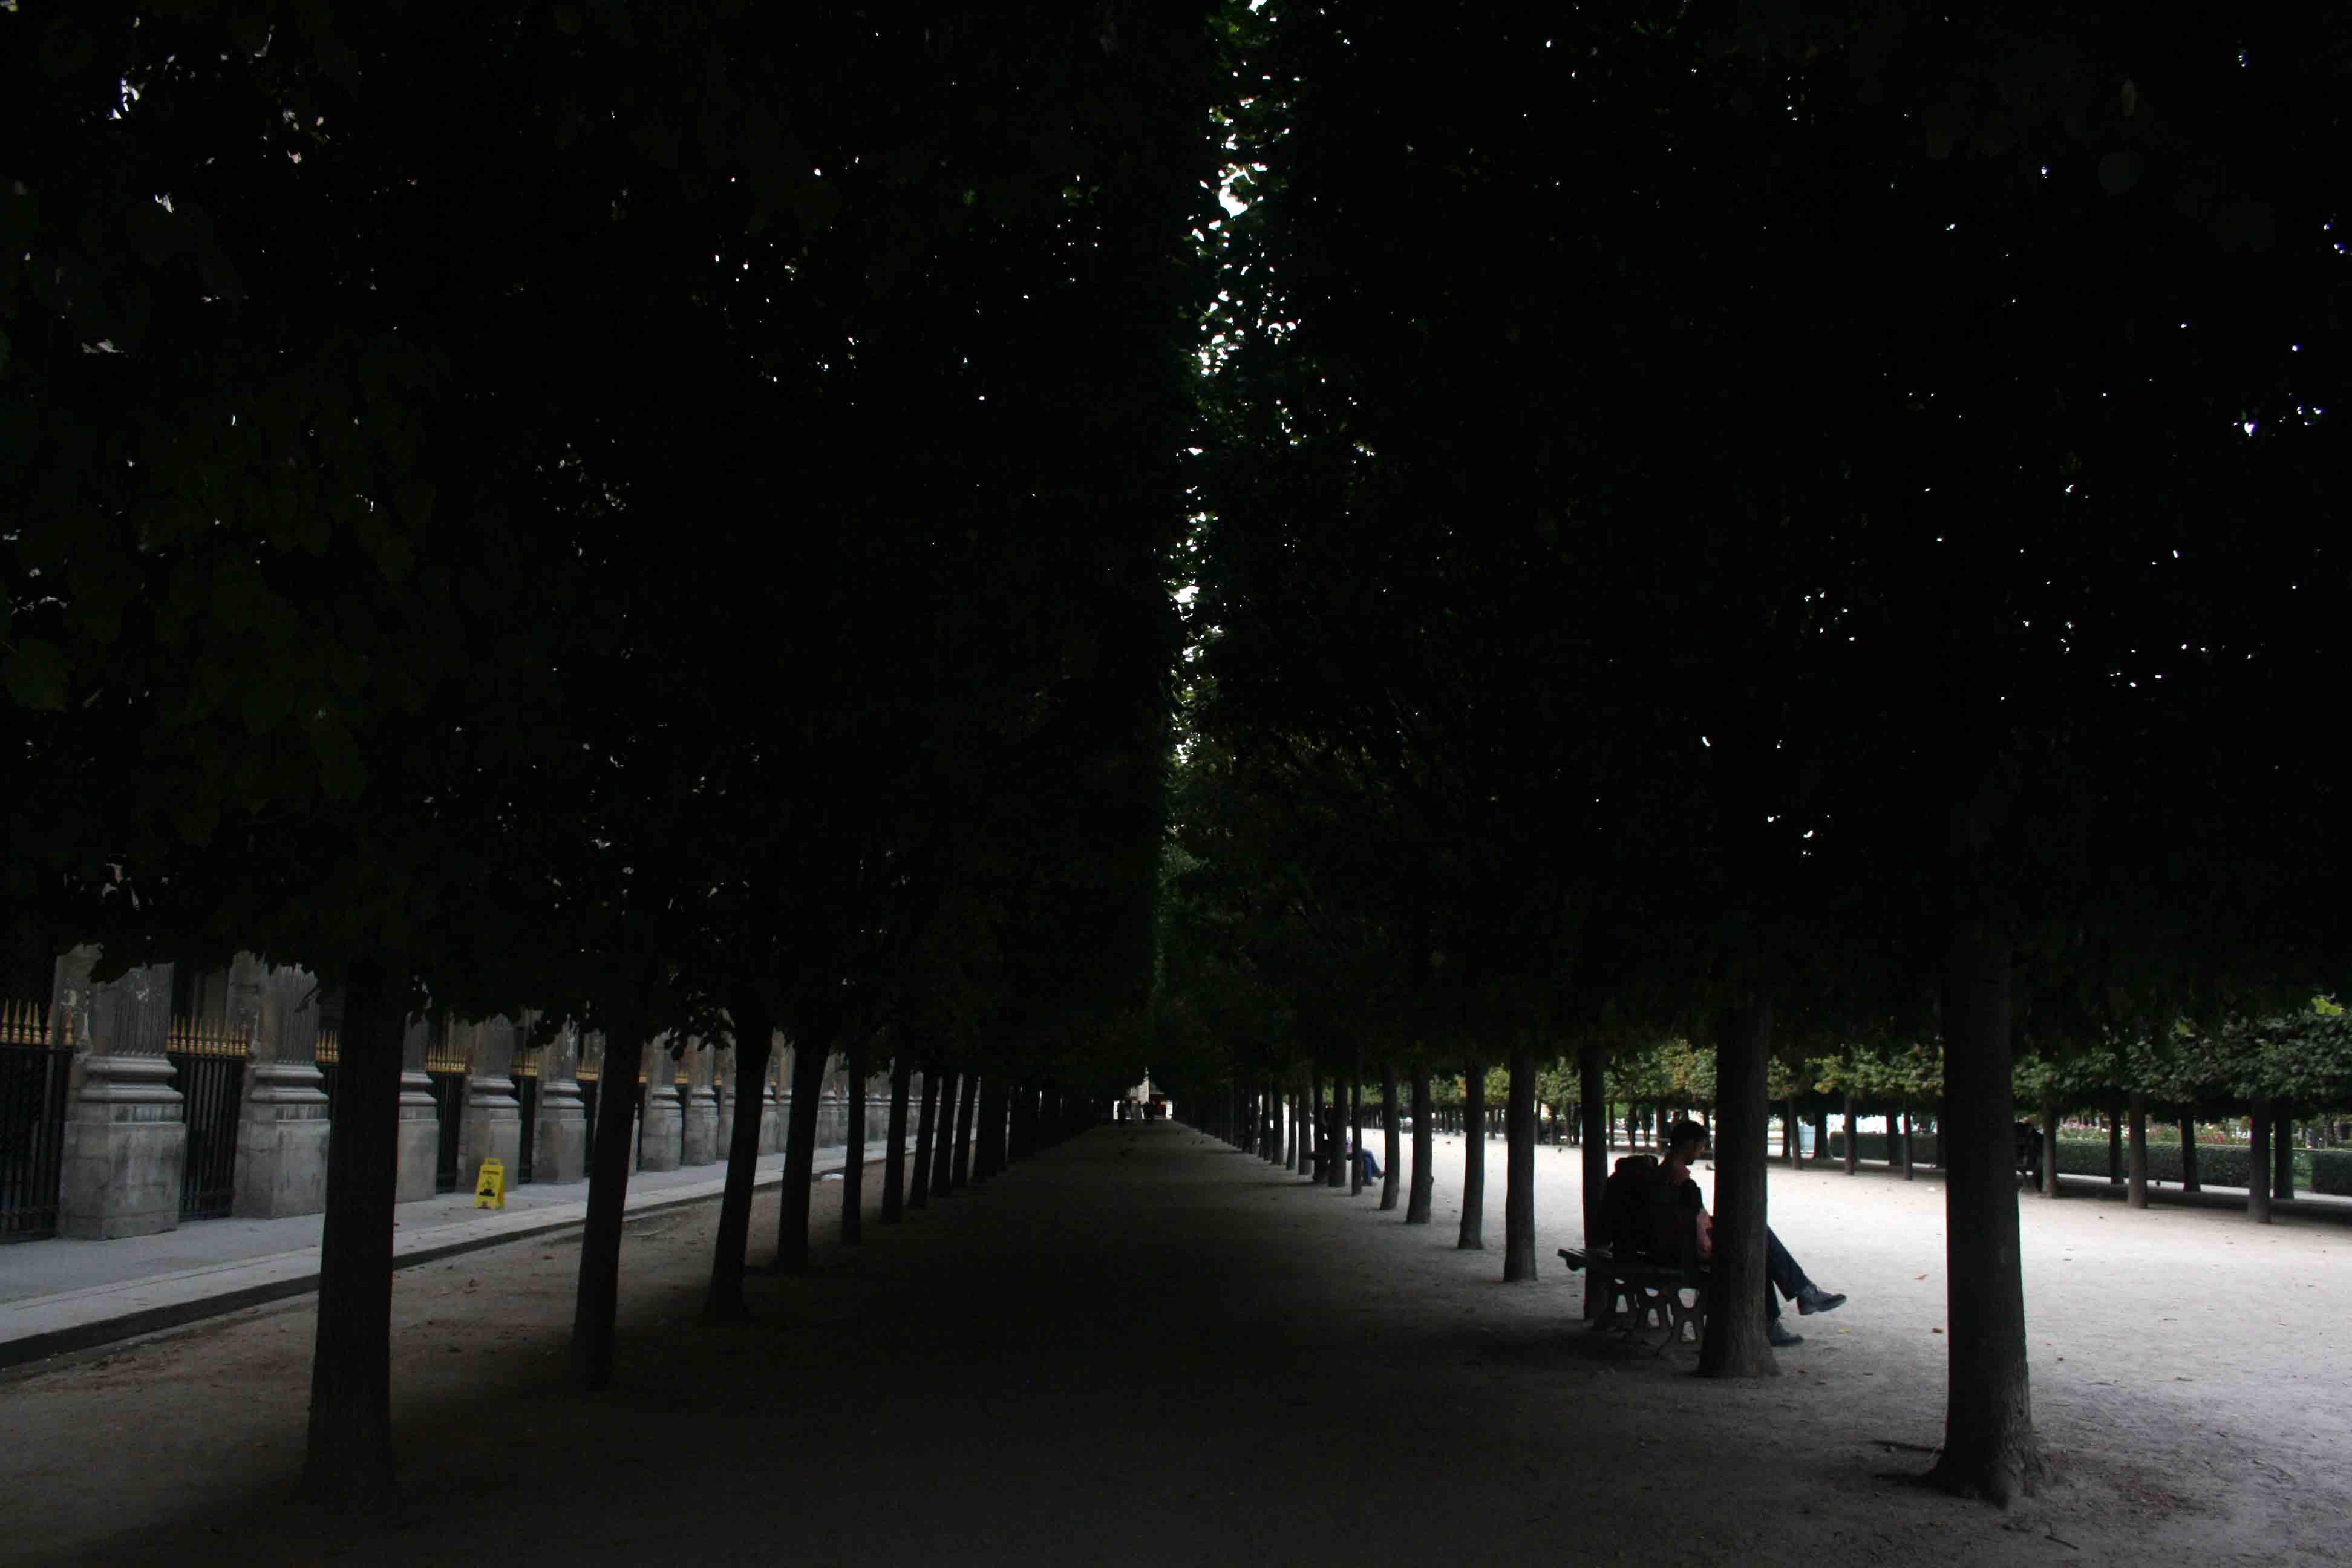 City Travel - Jardin du Palais Royal, Paris